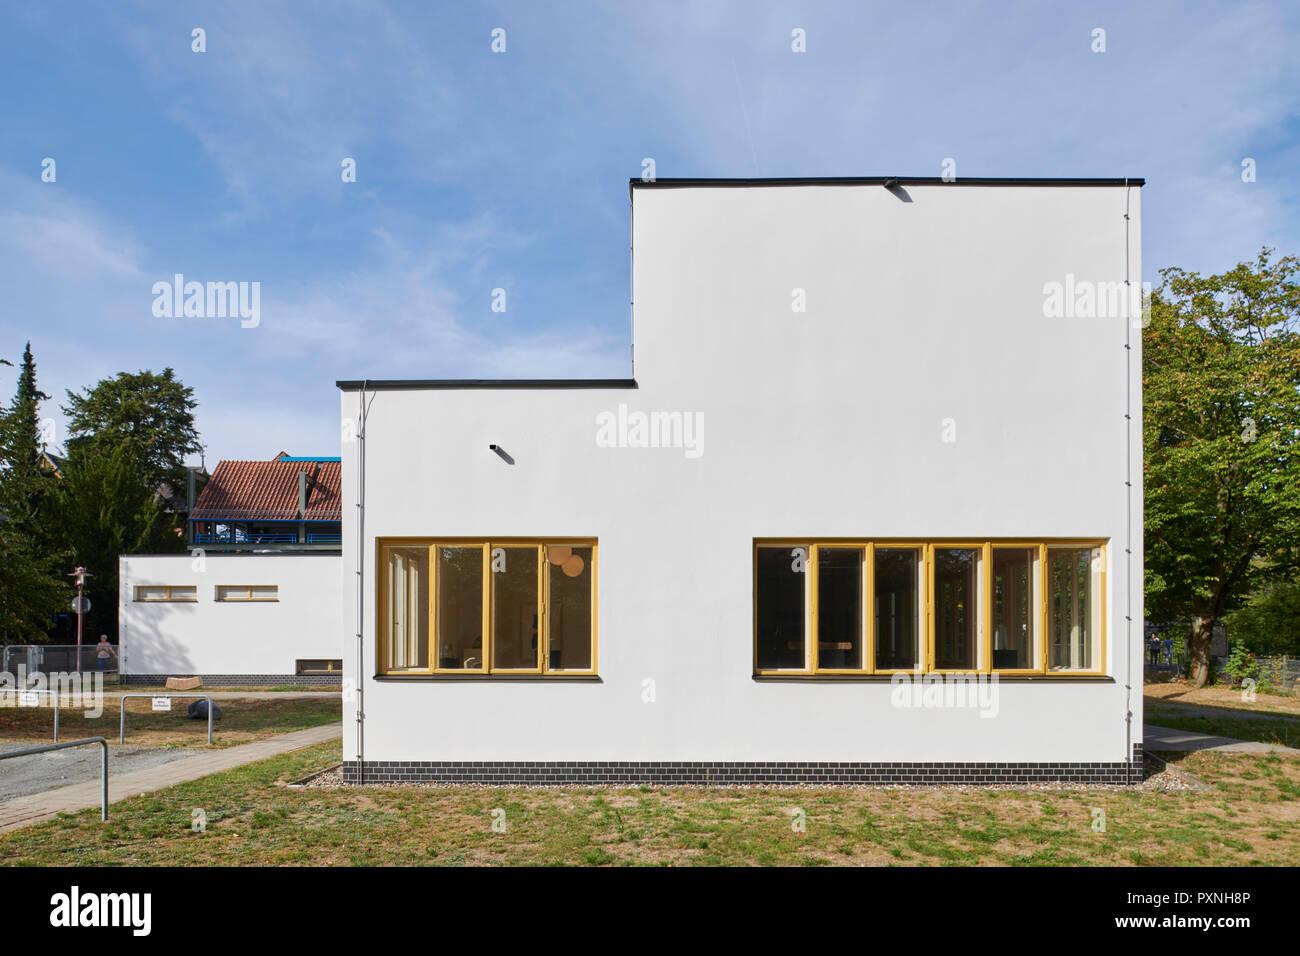 Direktorenhaus Celle - Stock Image